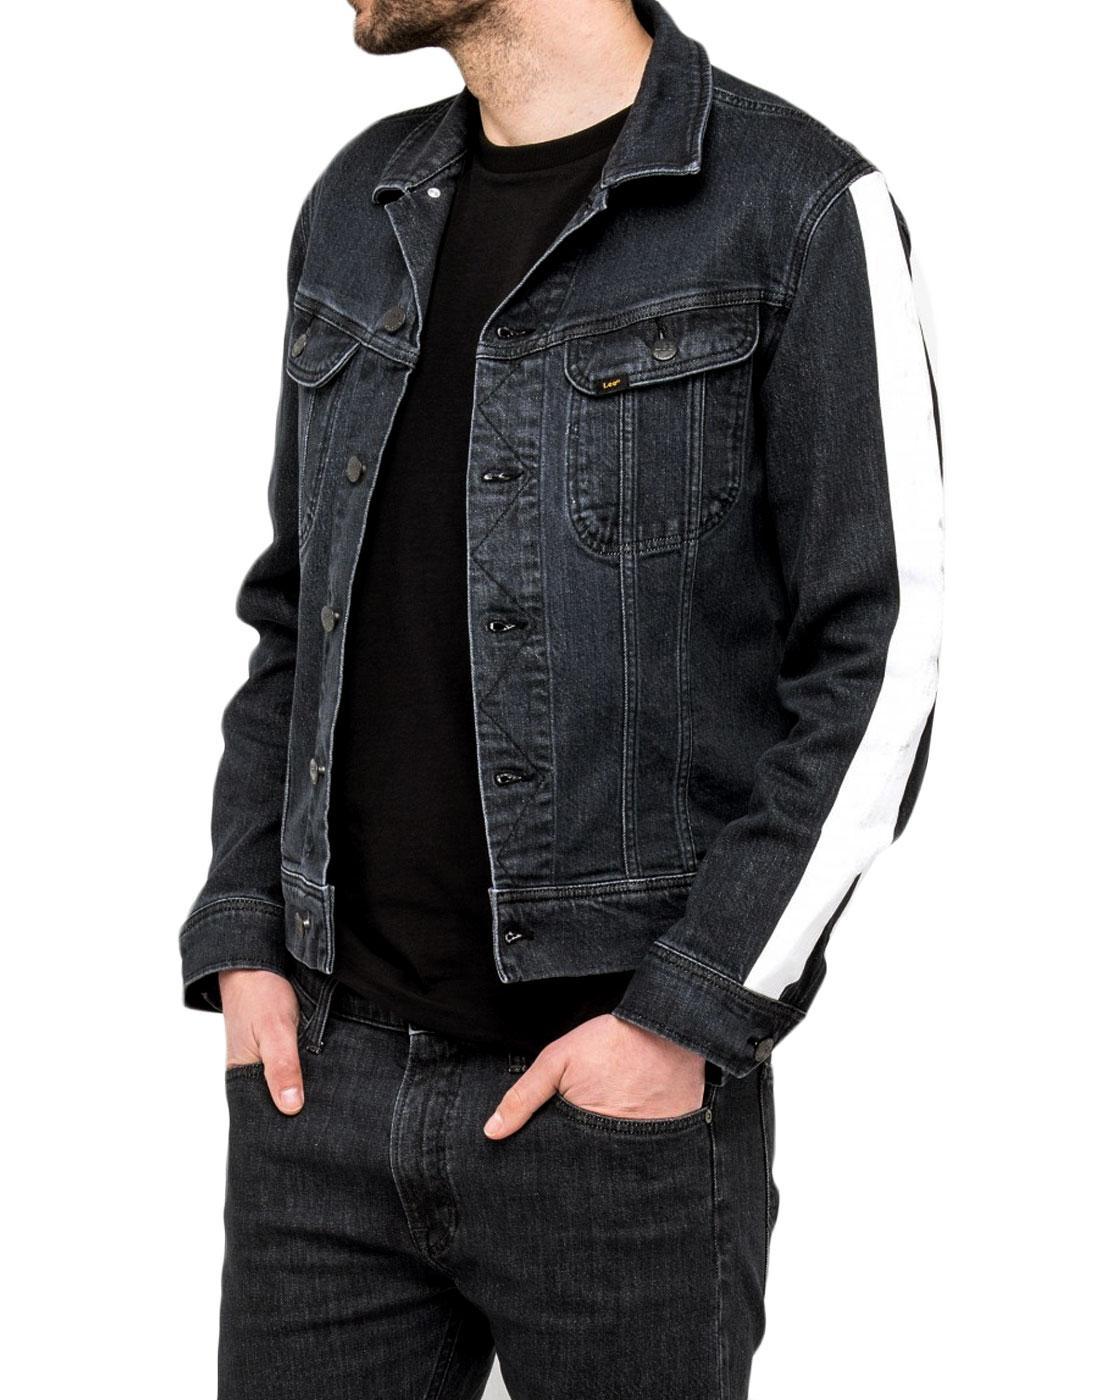 LEE Slim Rider Retro Baseline Stripe Denim Jacket